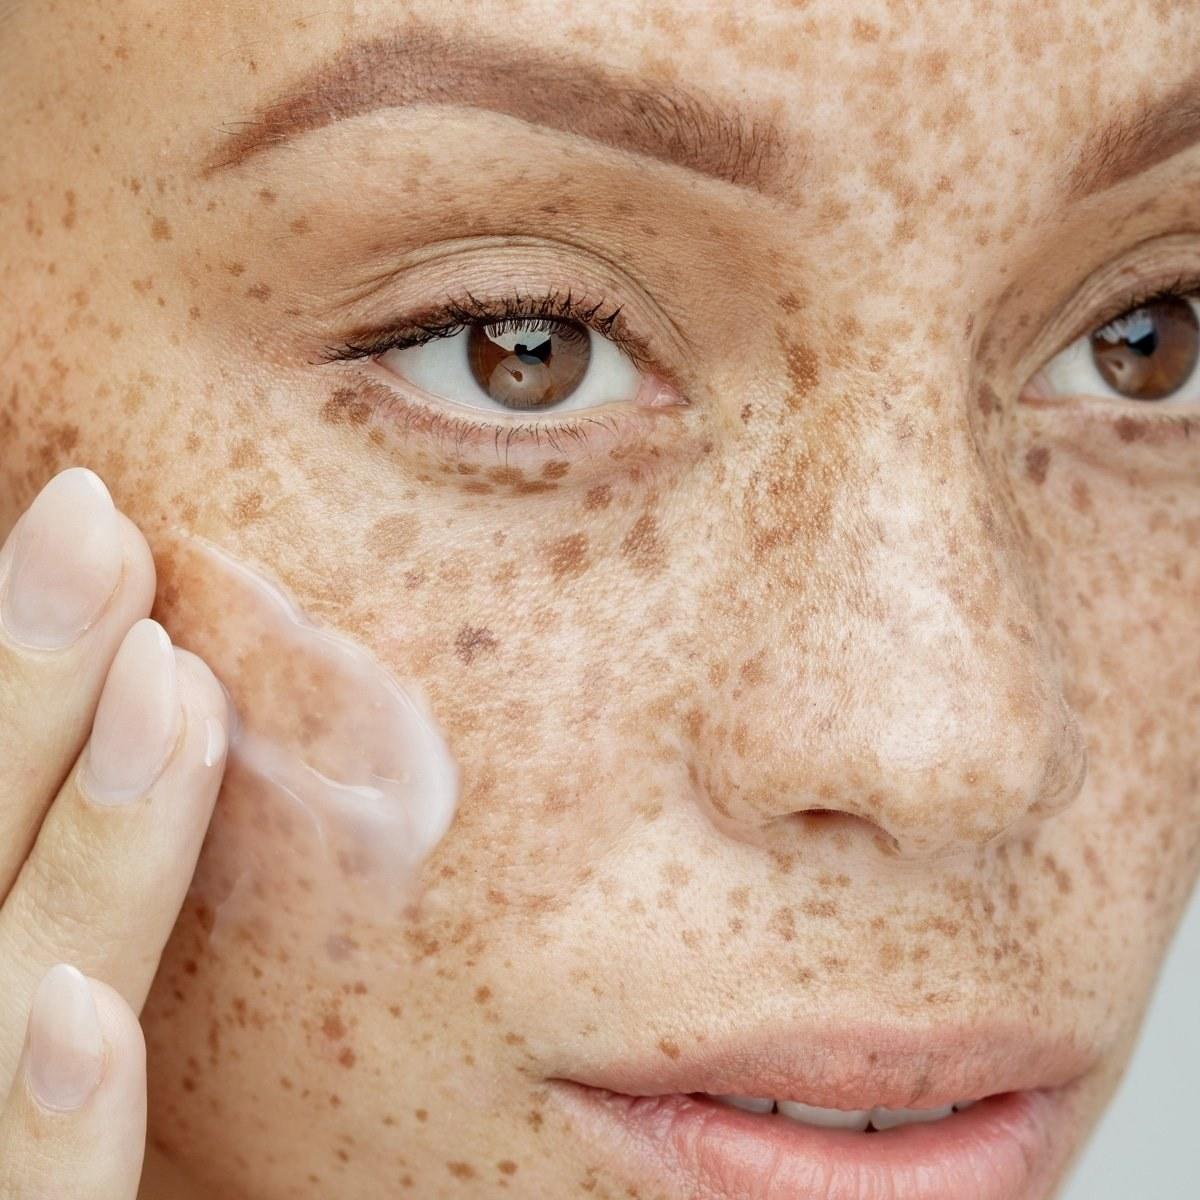 model uses hydrating moisturizer on face